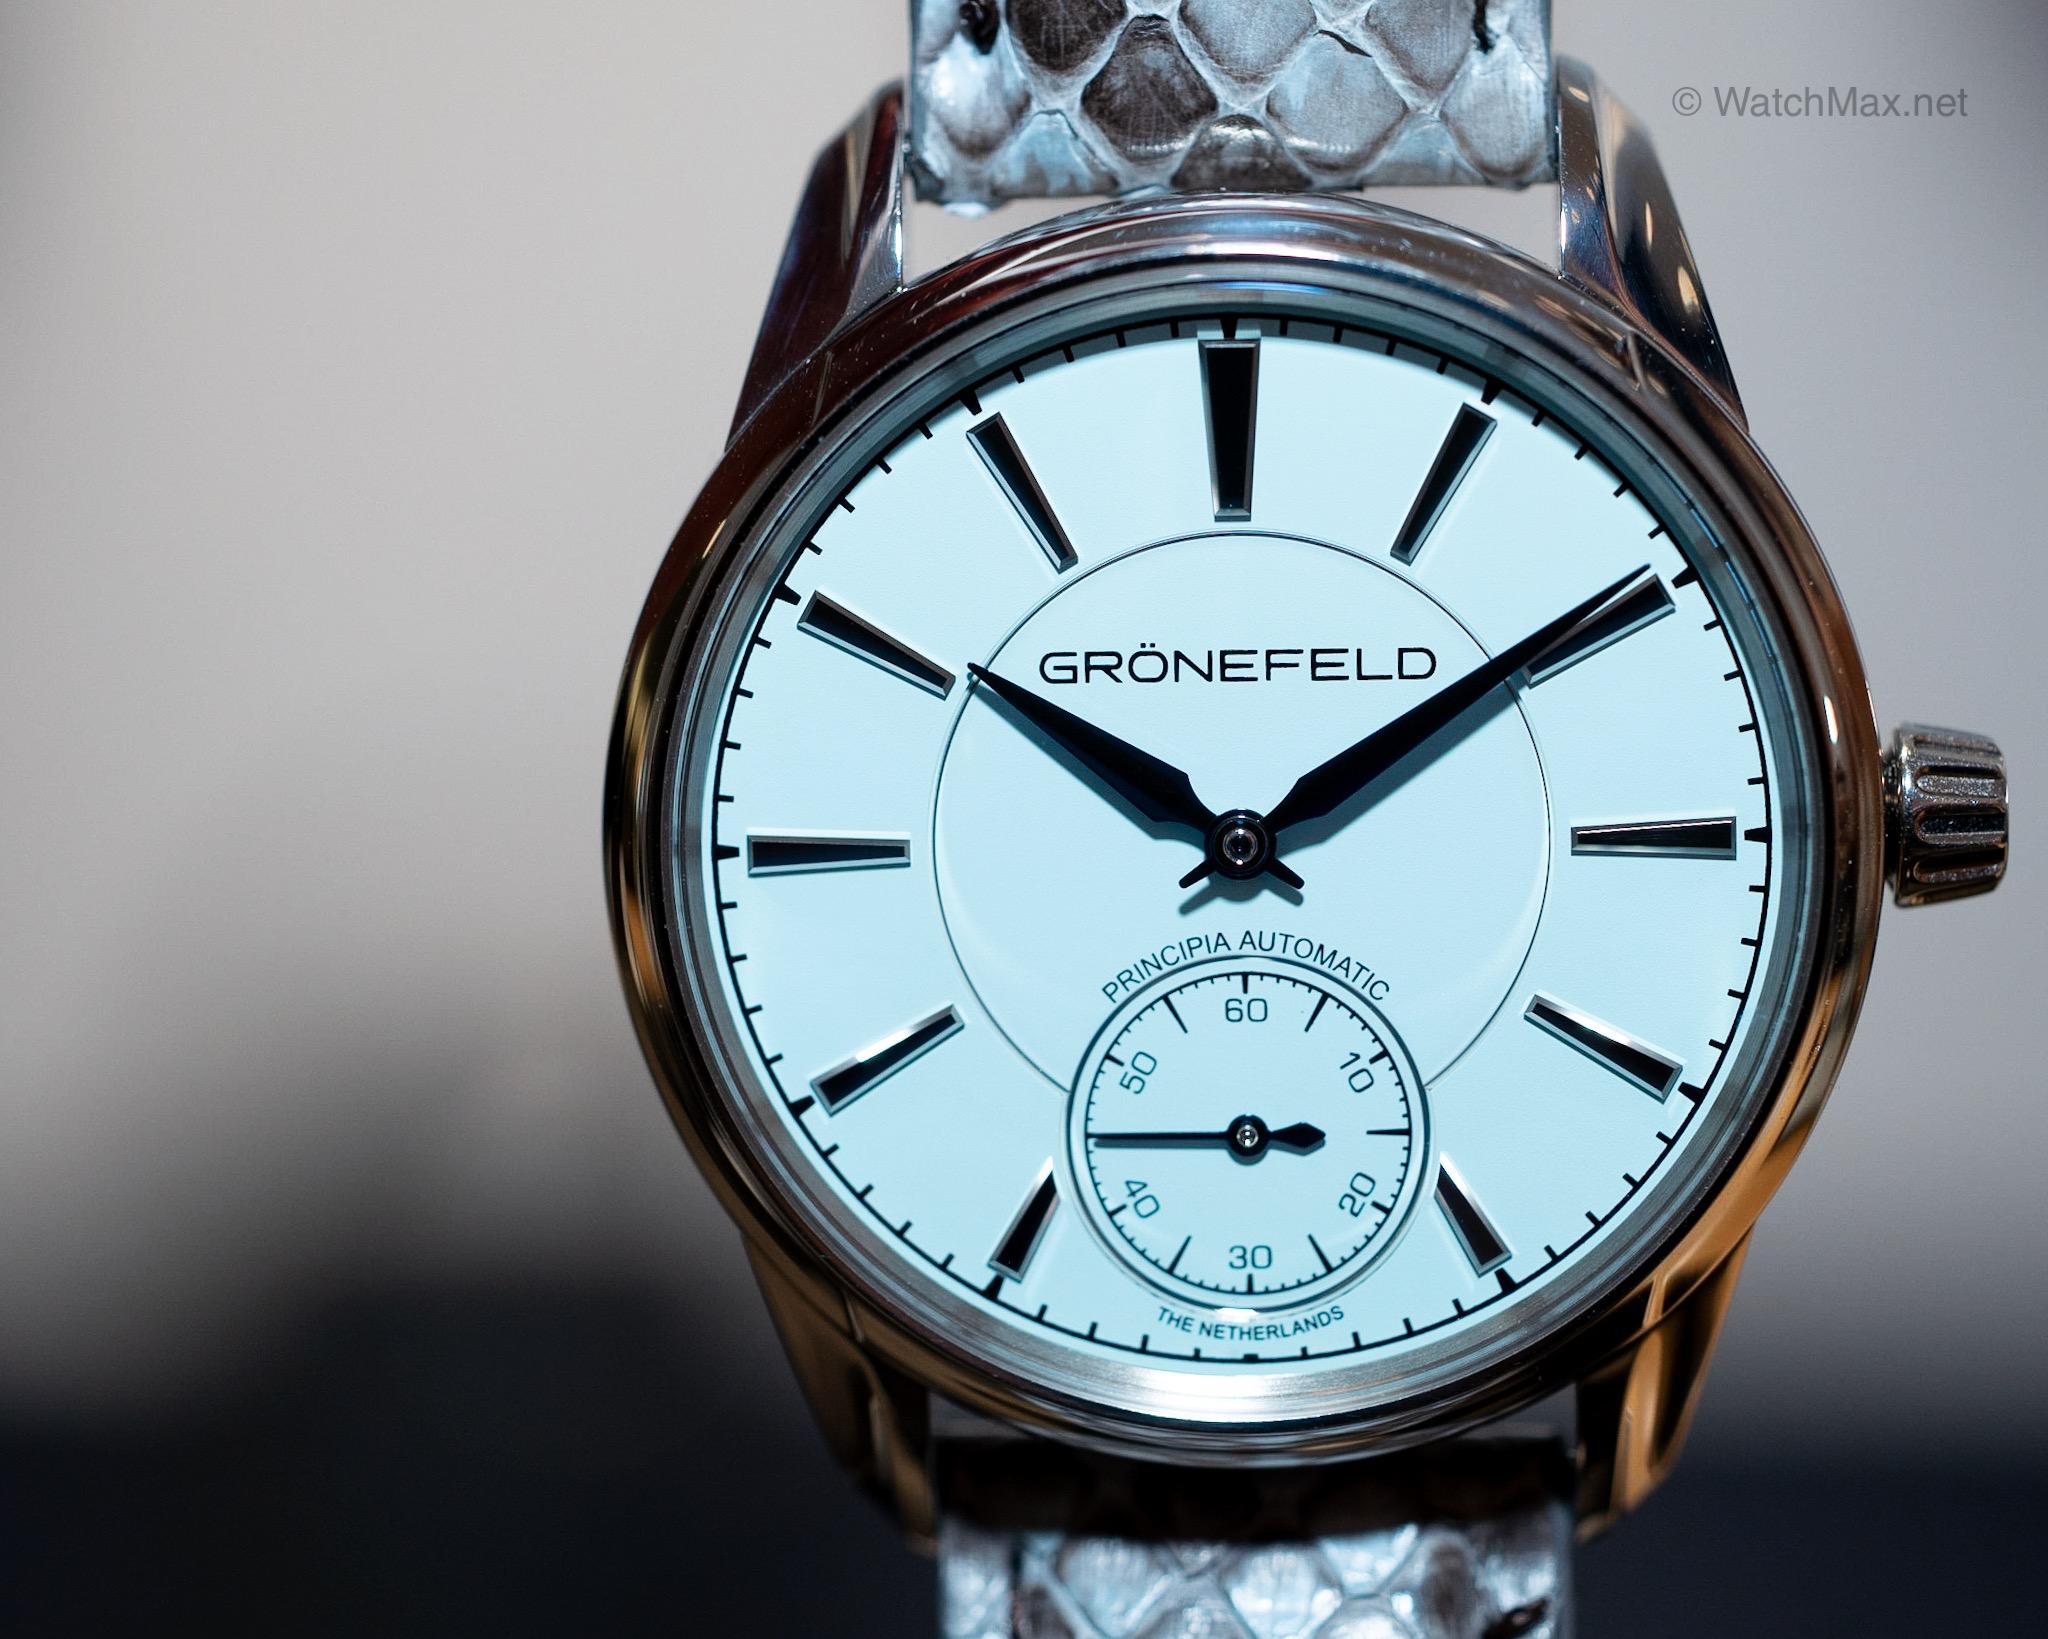 gronefeld-principia-watch-sihh-2019-5.jpg